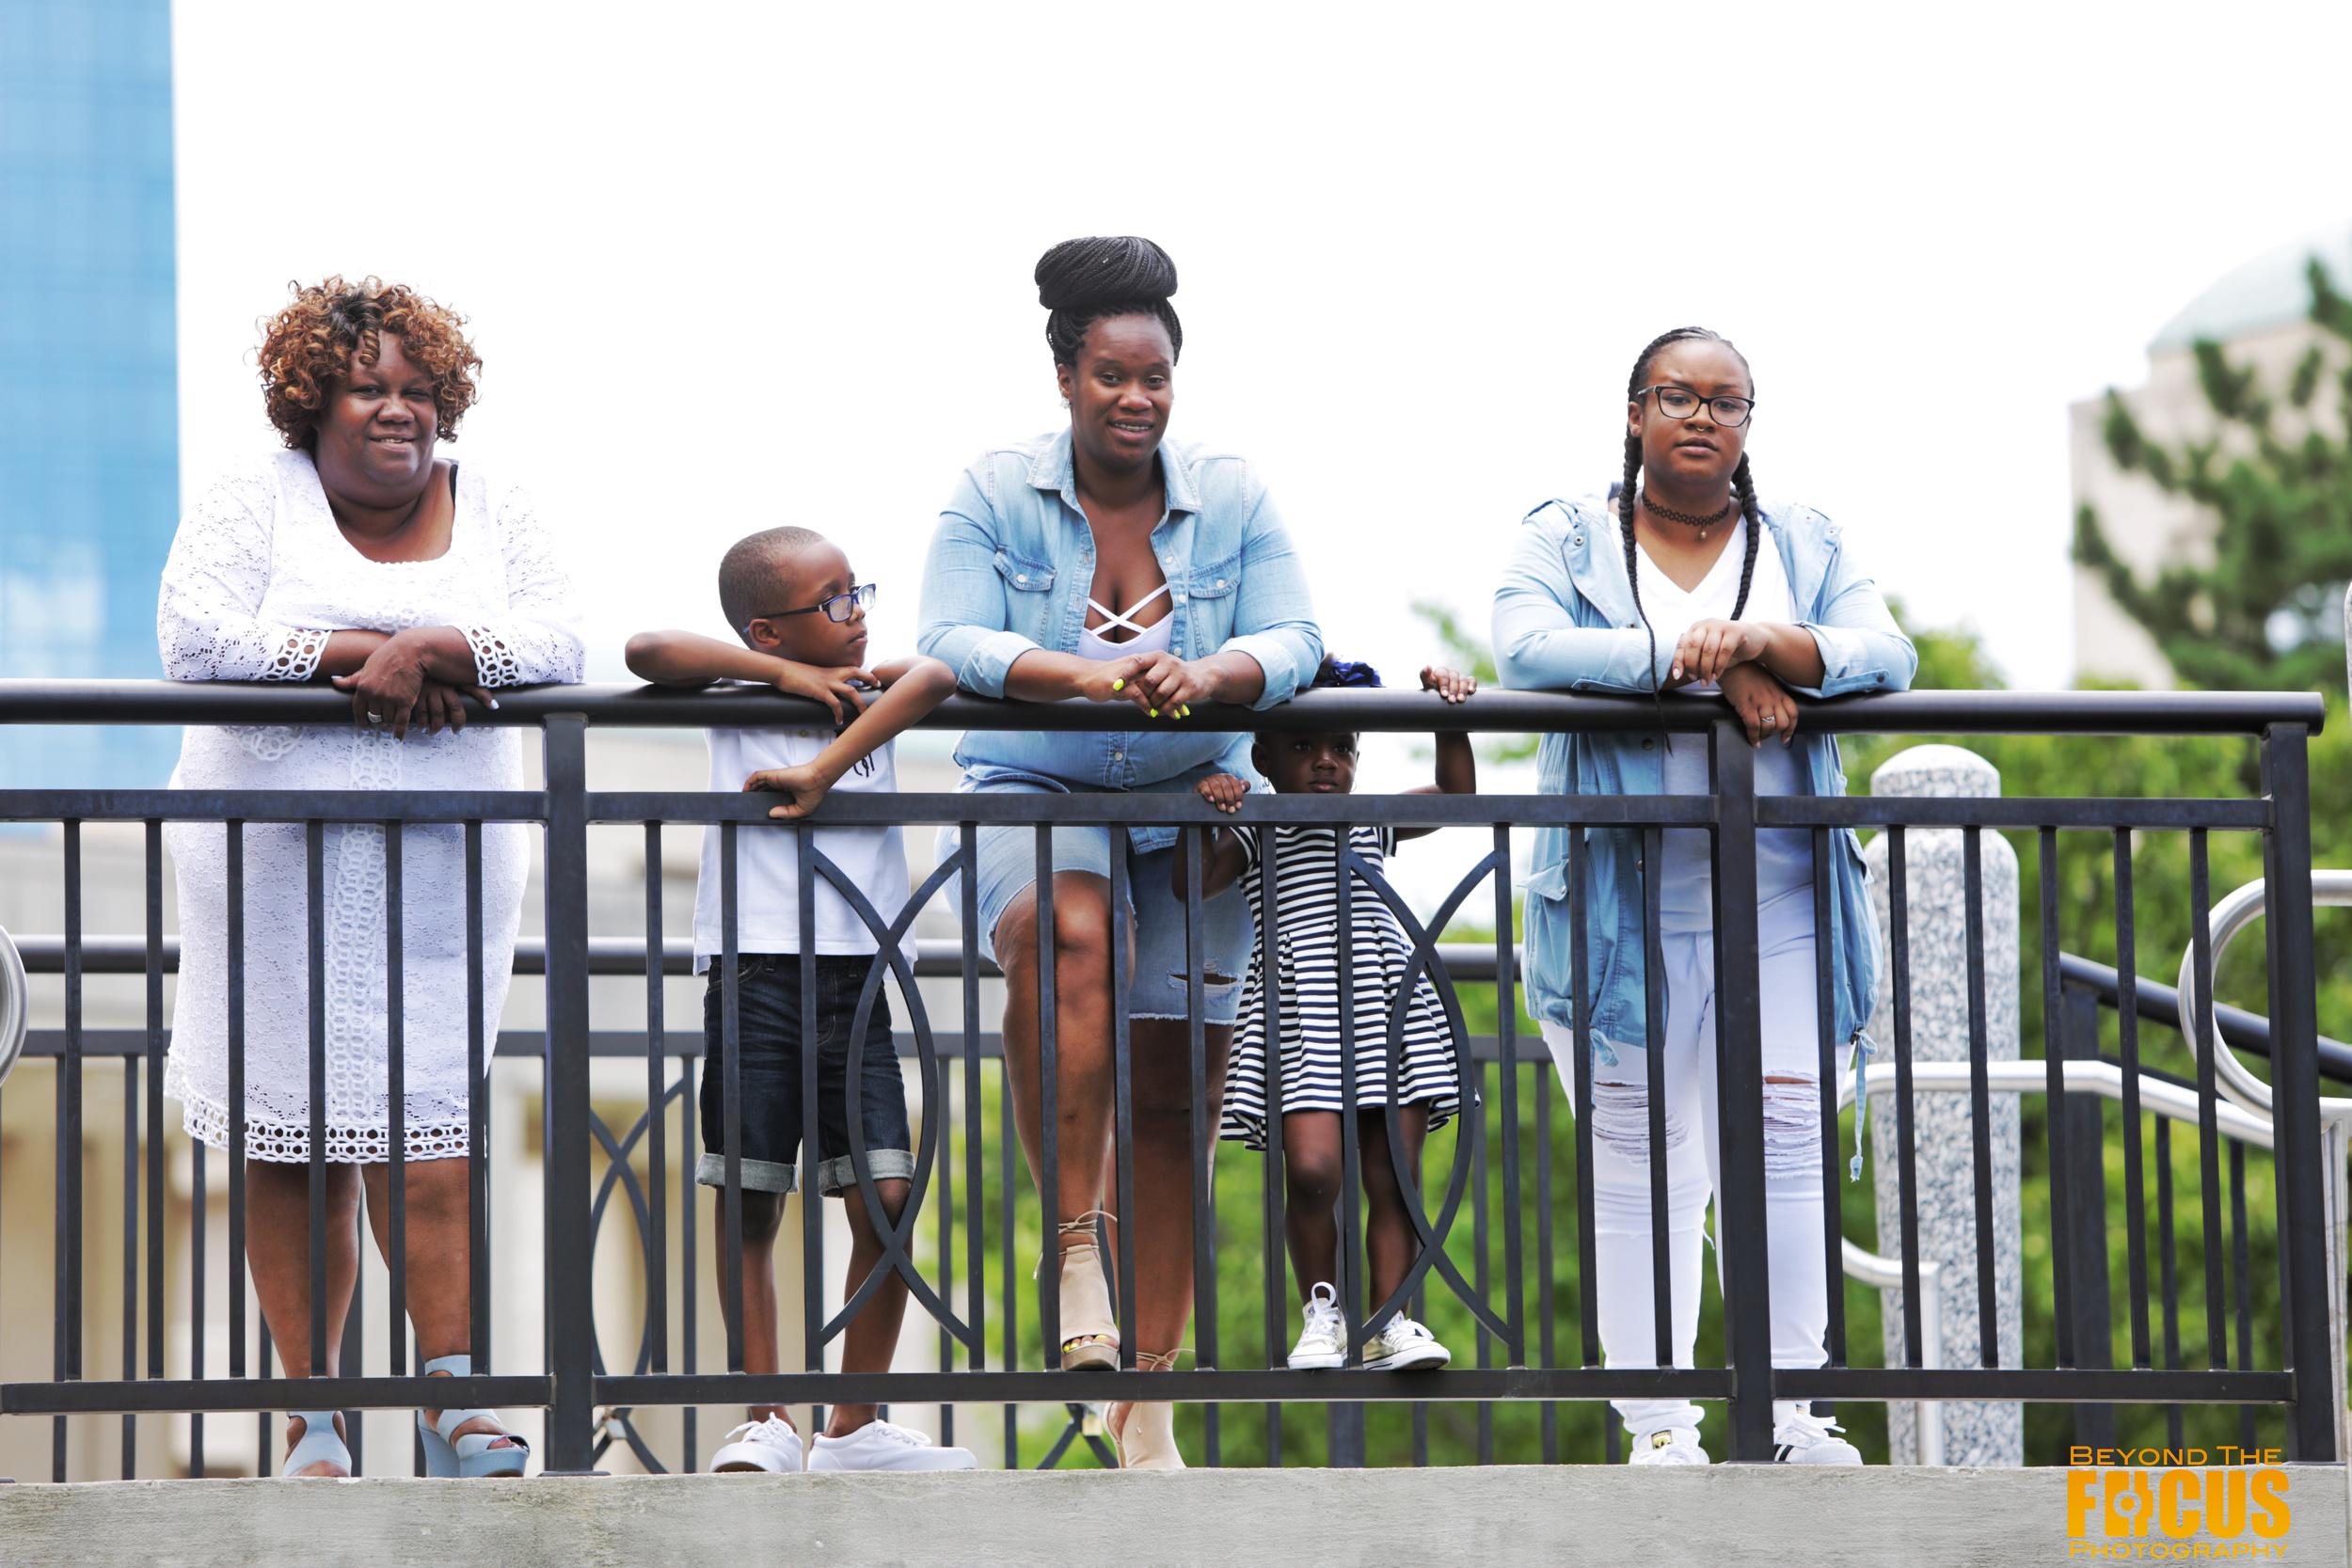 Herring Family Photos Watermarked28.jpg